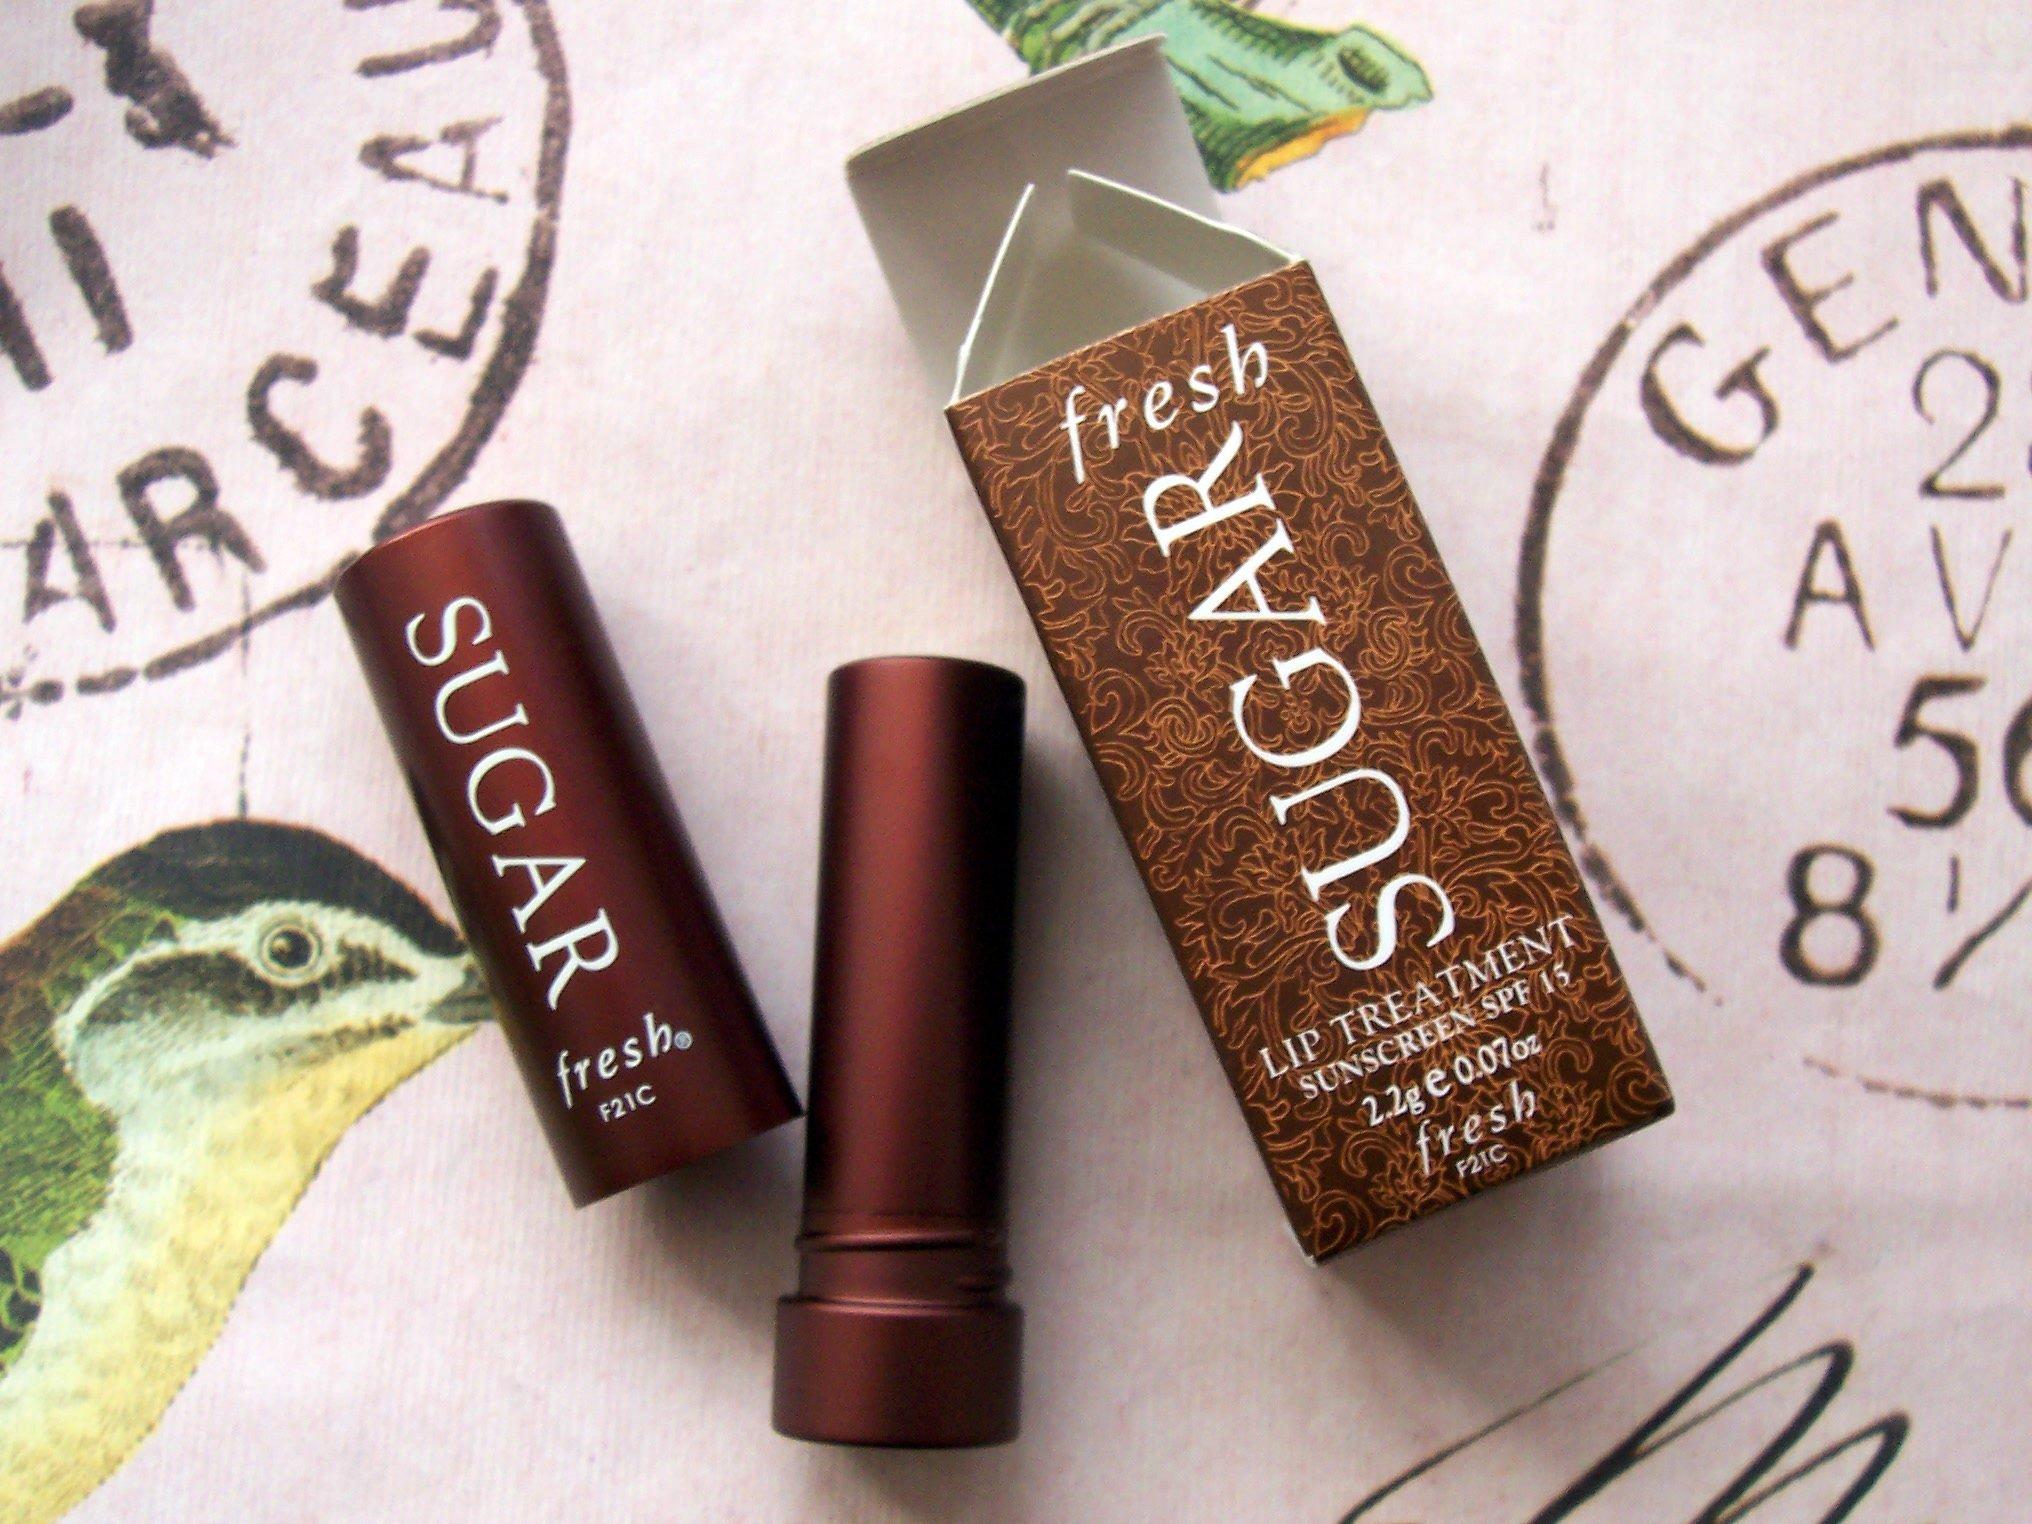 Fresh Sugar Lip Treatment Sunscreen spf 15 - Mini Travel size 2.2g/.07oz. in box